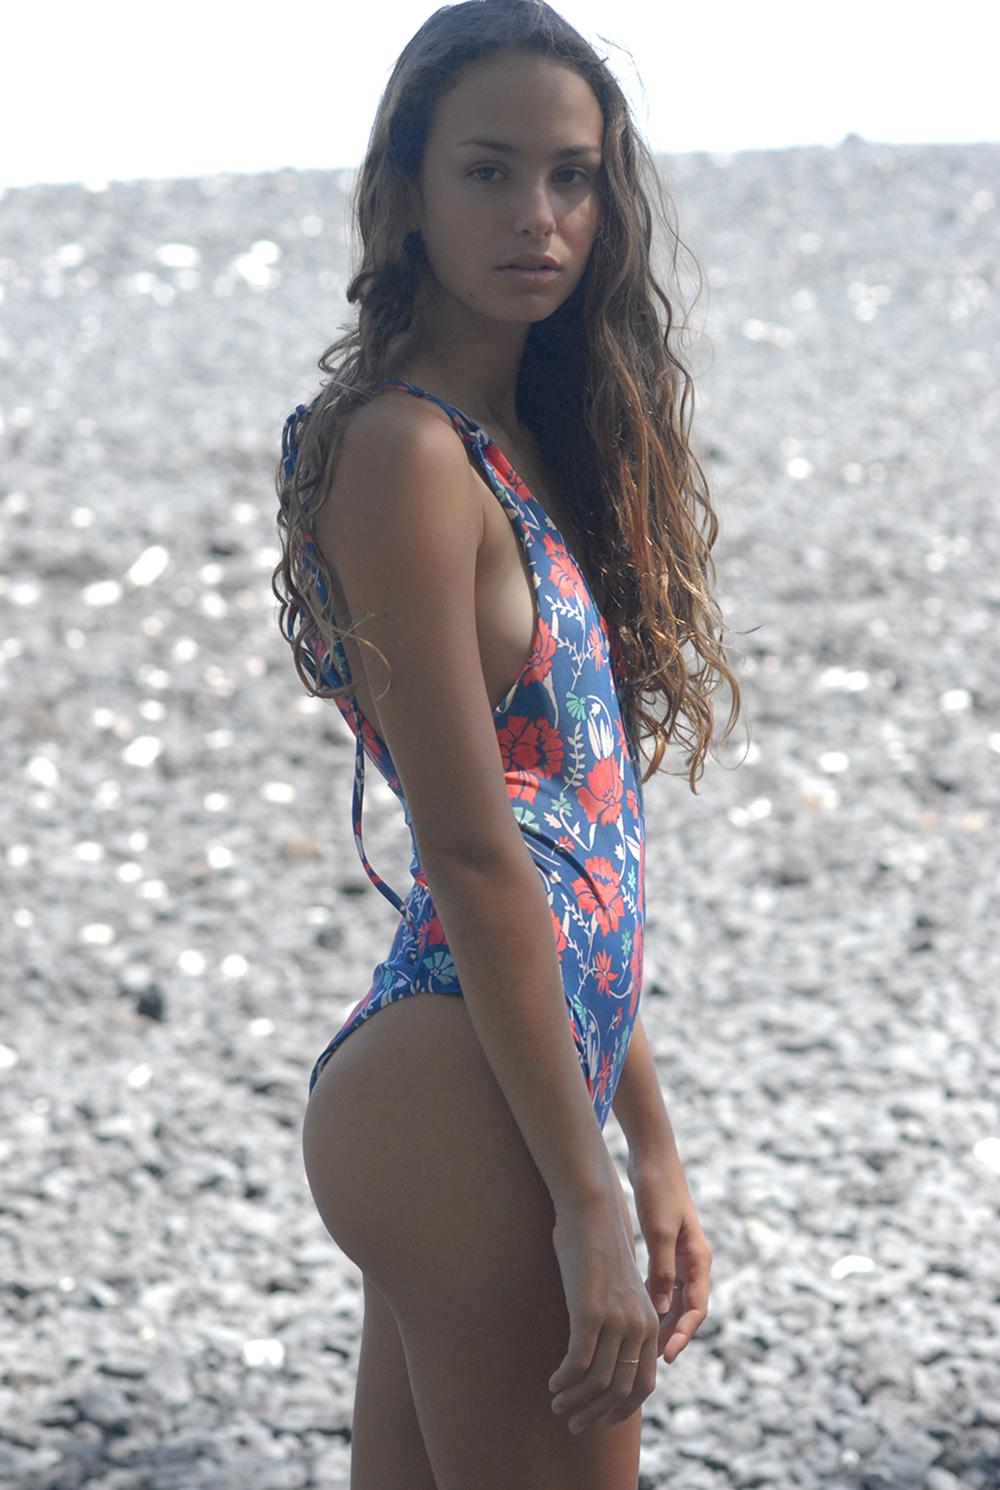 Swimbook_Tori_Praver_swimwear_Helena_Brewbaker_DSC_0874.jpg